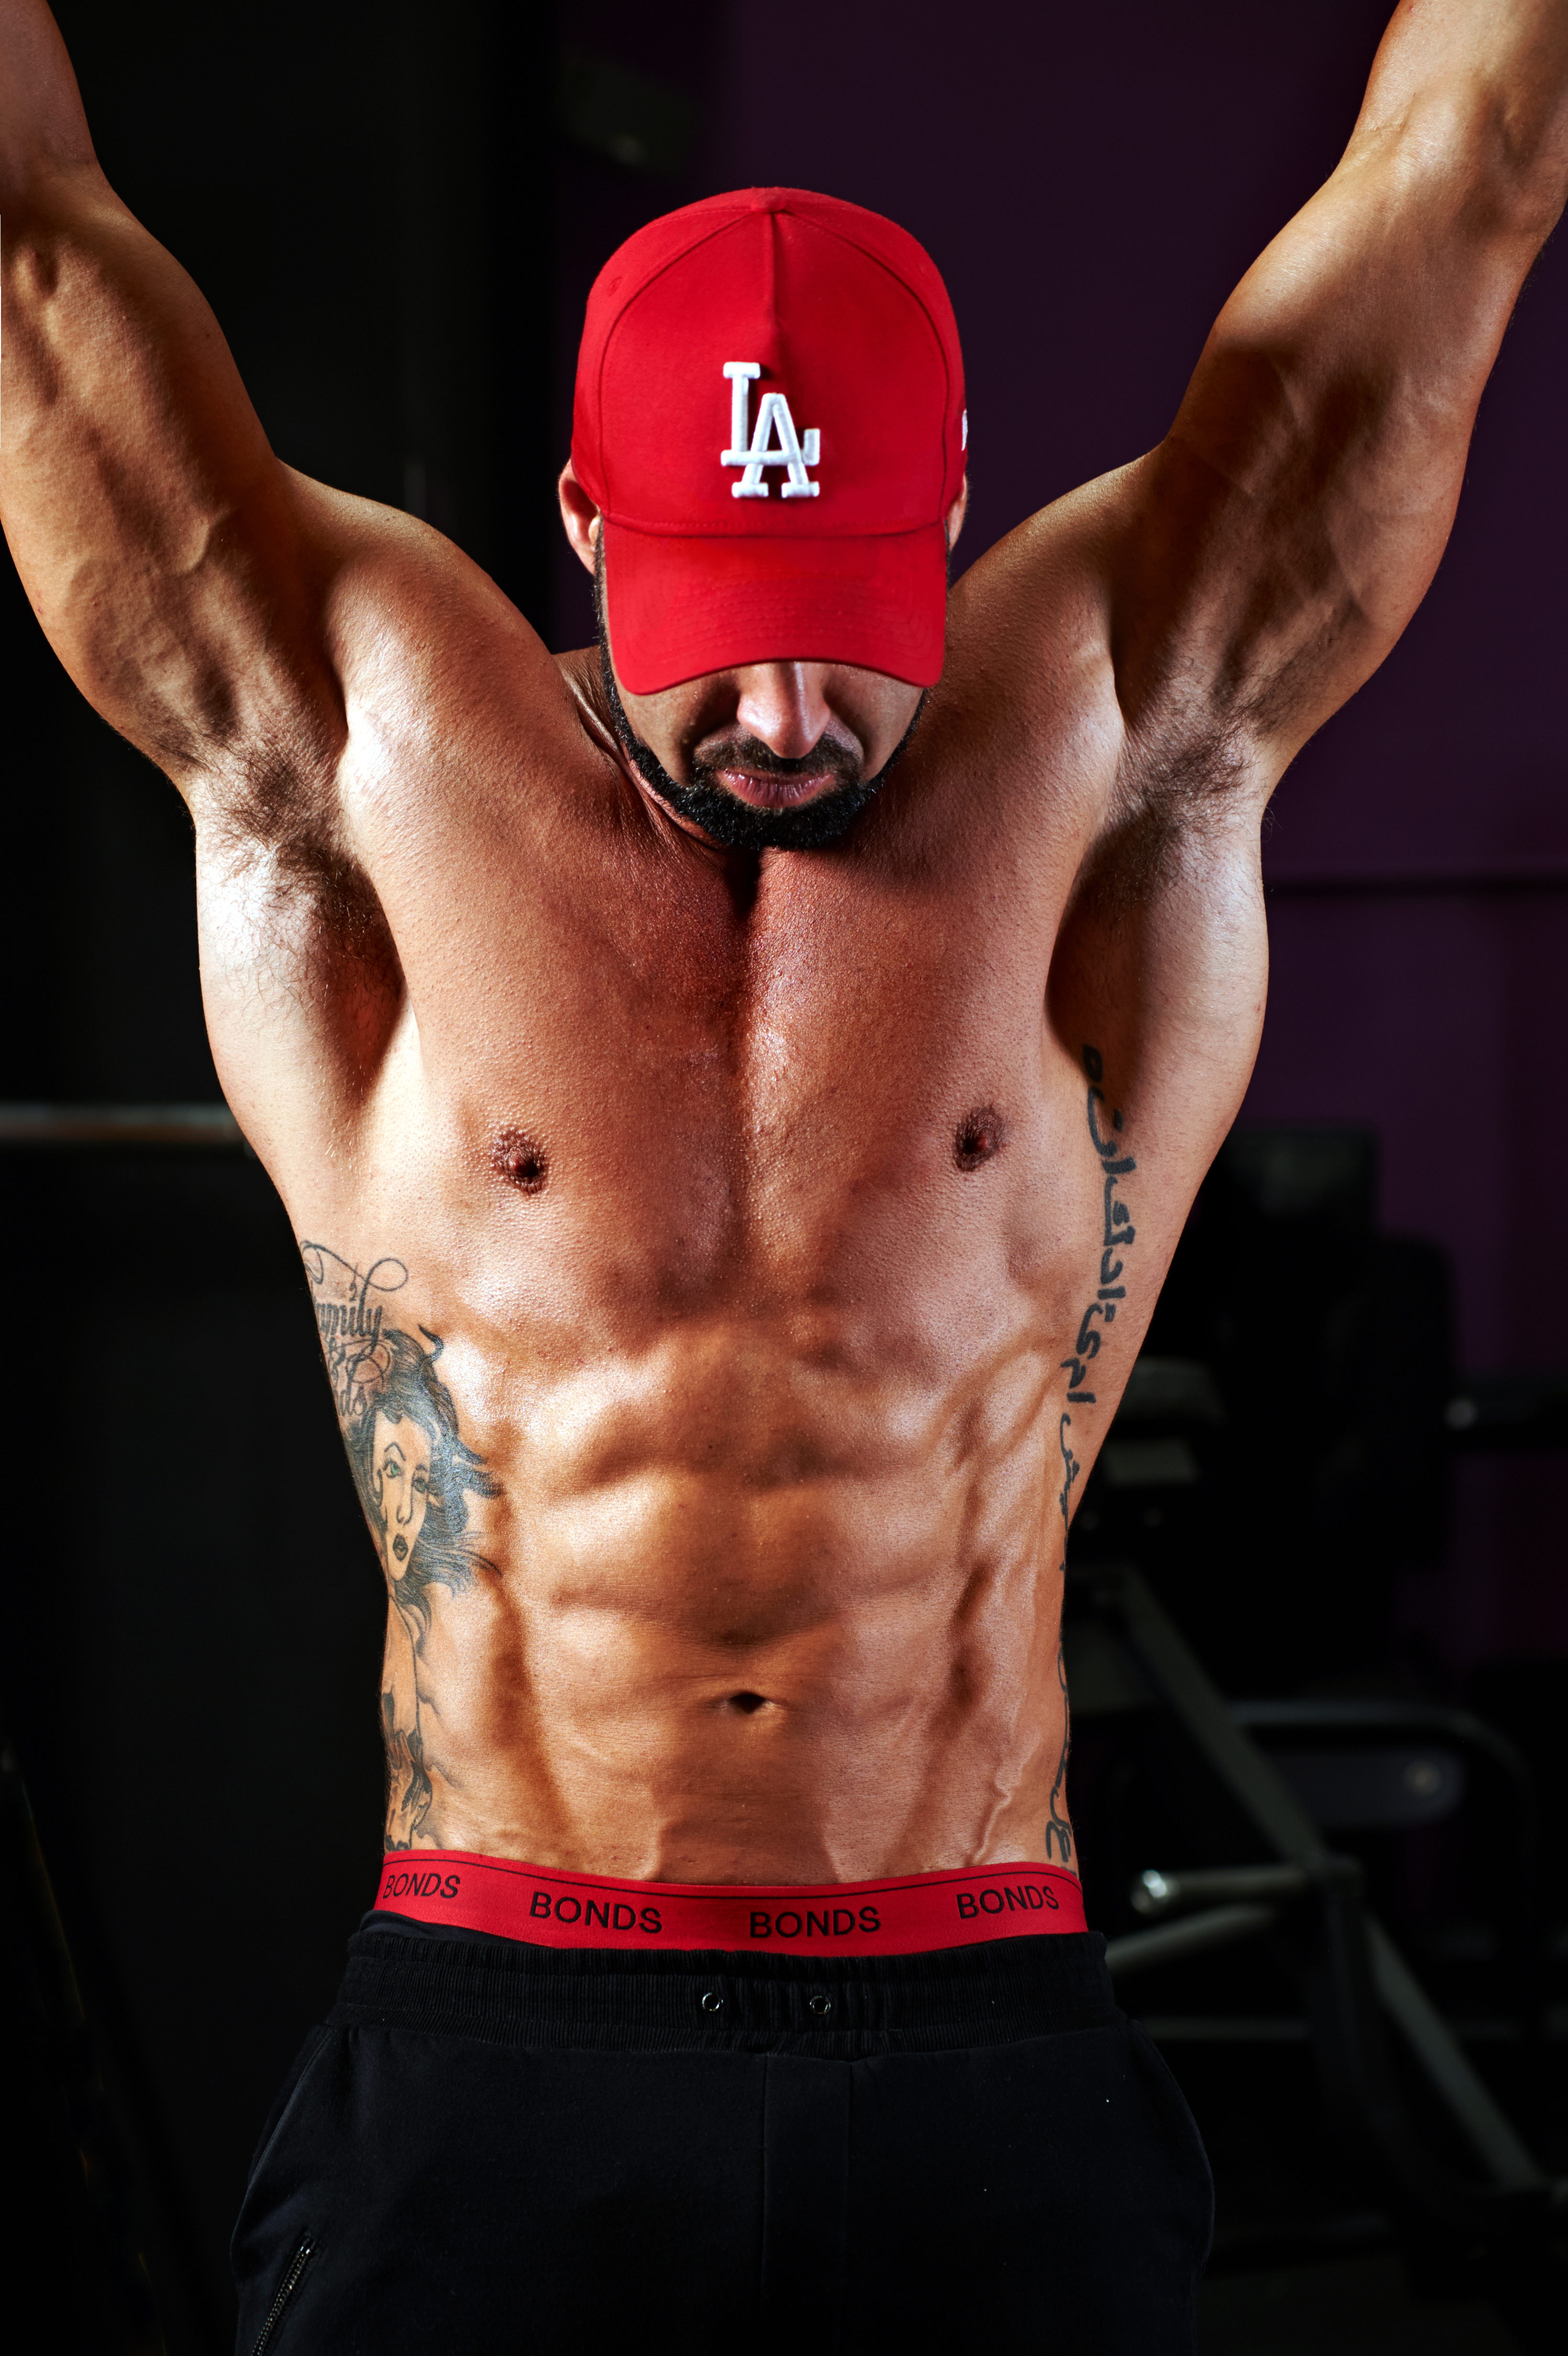 Daily Bodybuilding Motivation: Amazingly Aesthetic and